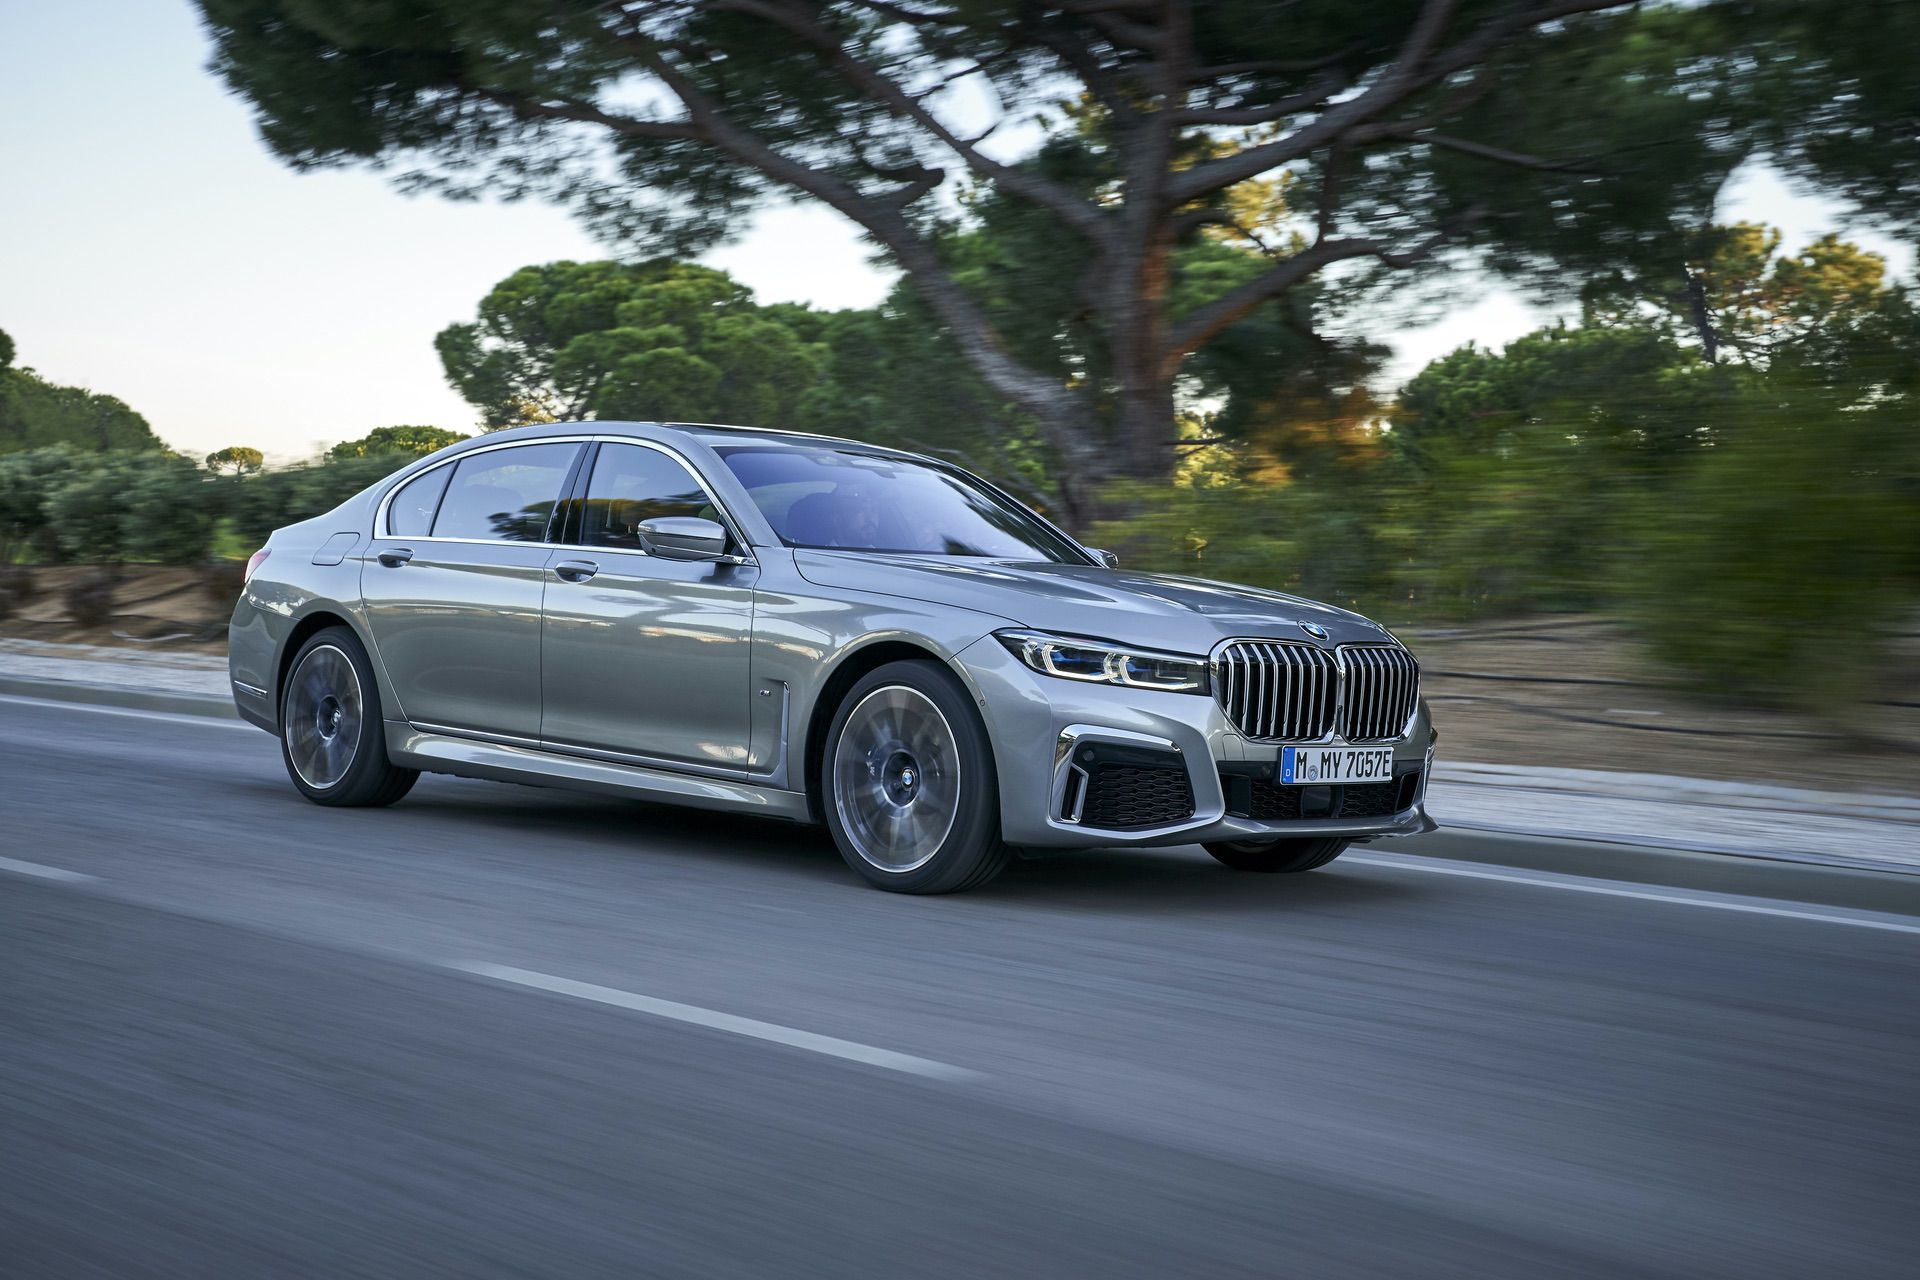 BMW 745Le hybrid test drive 27